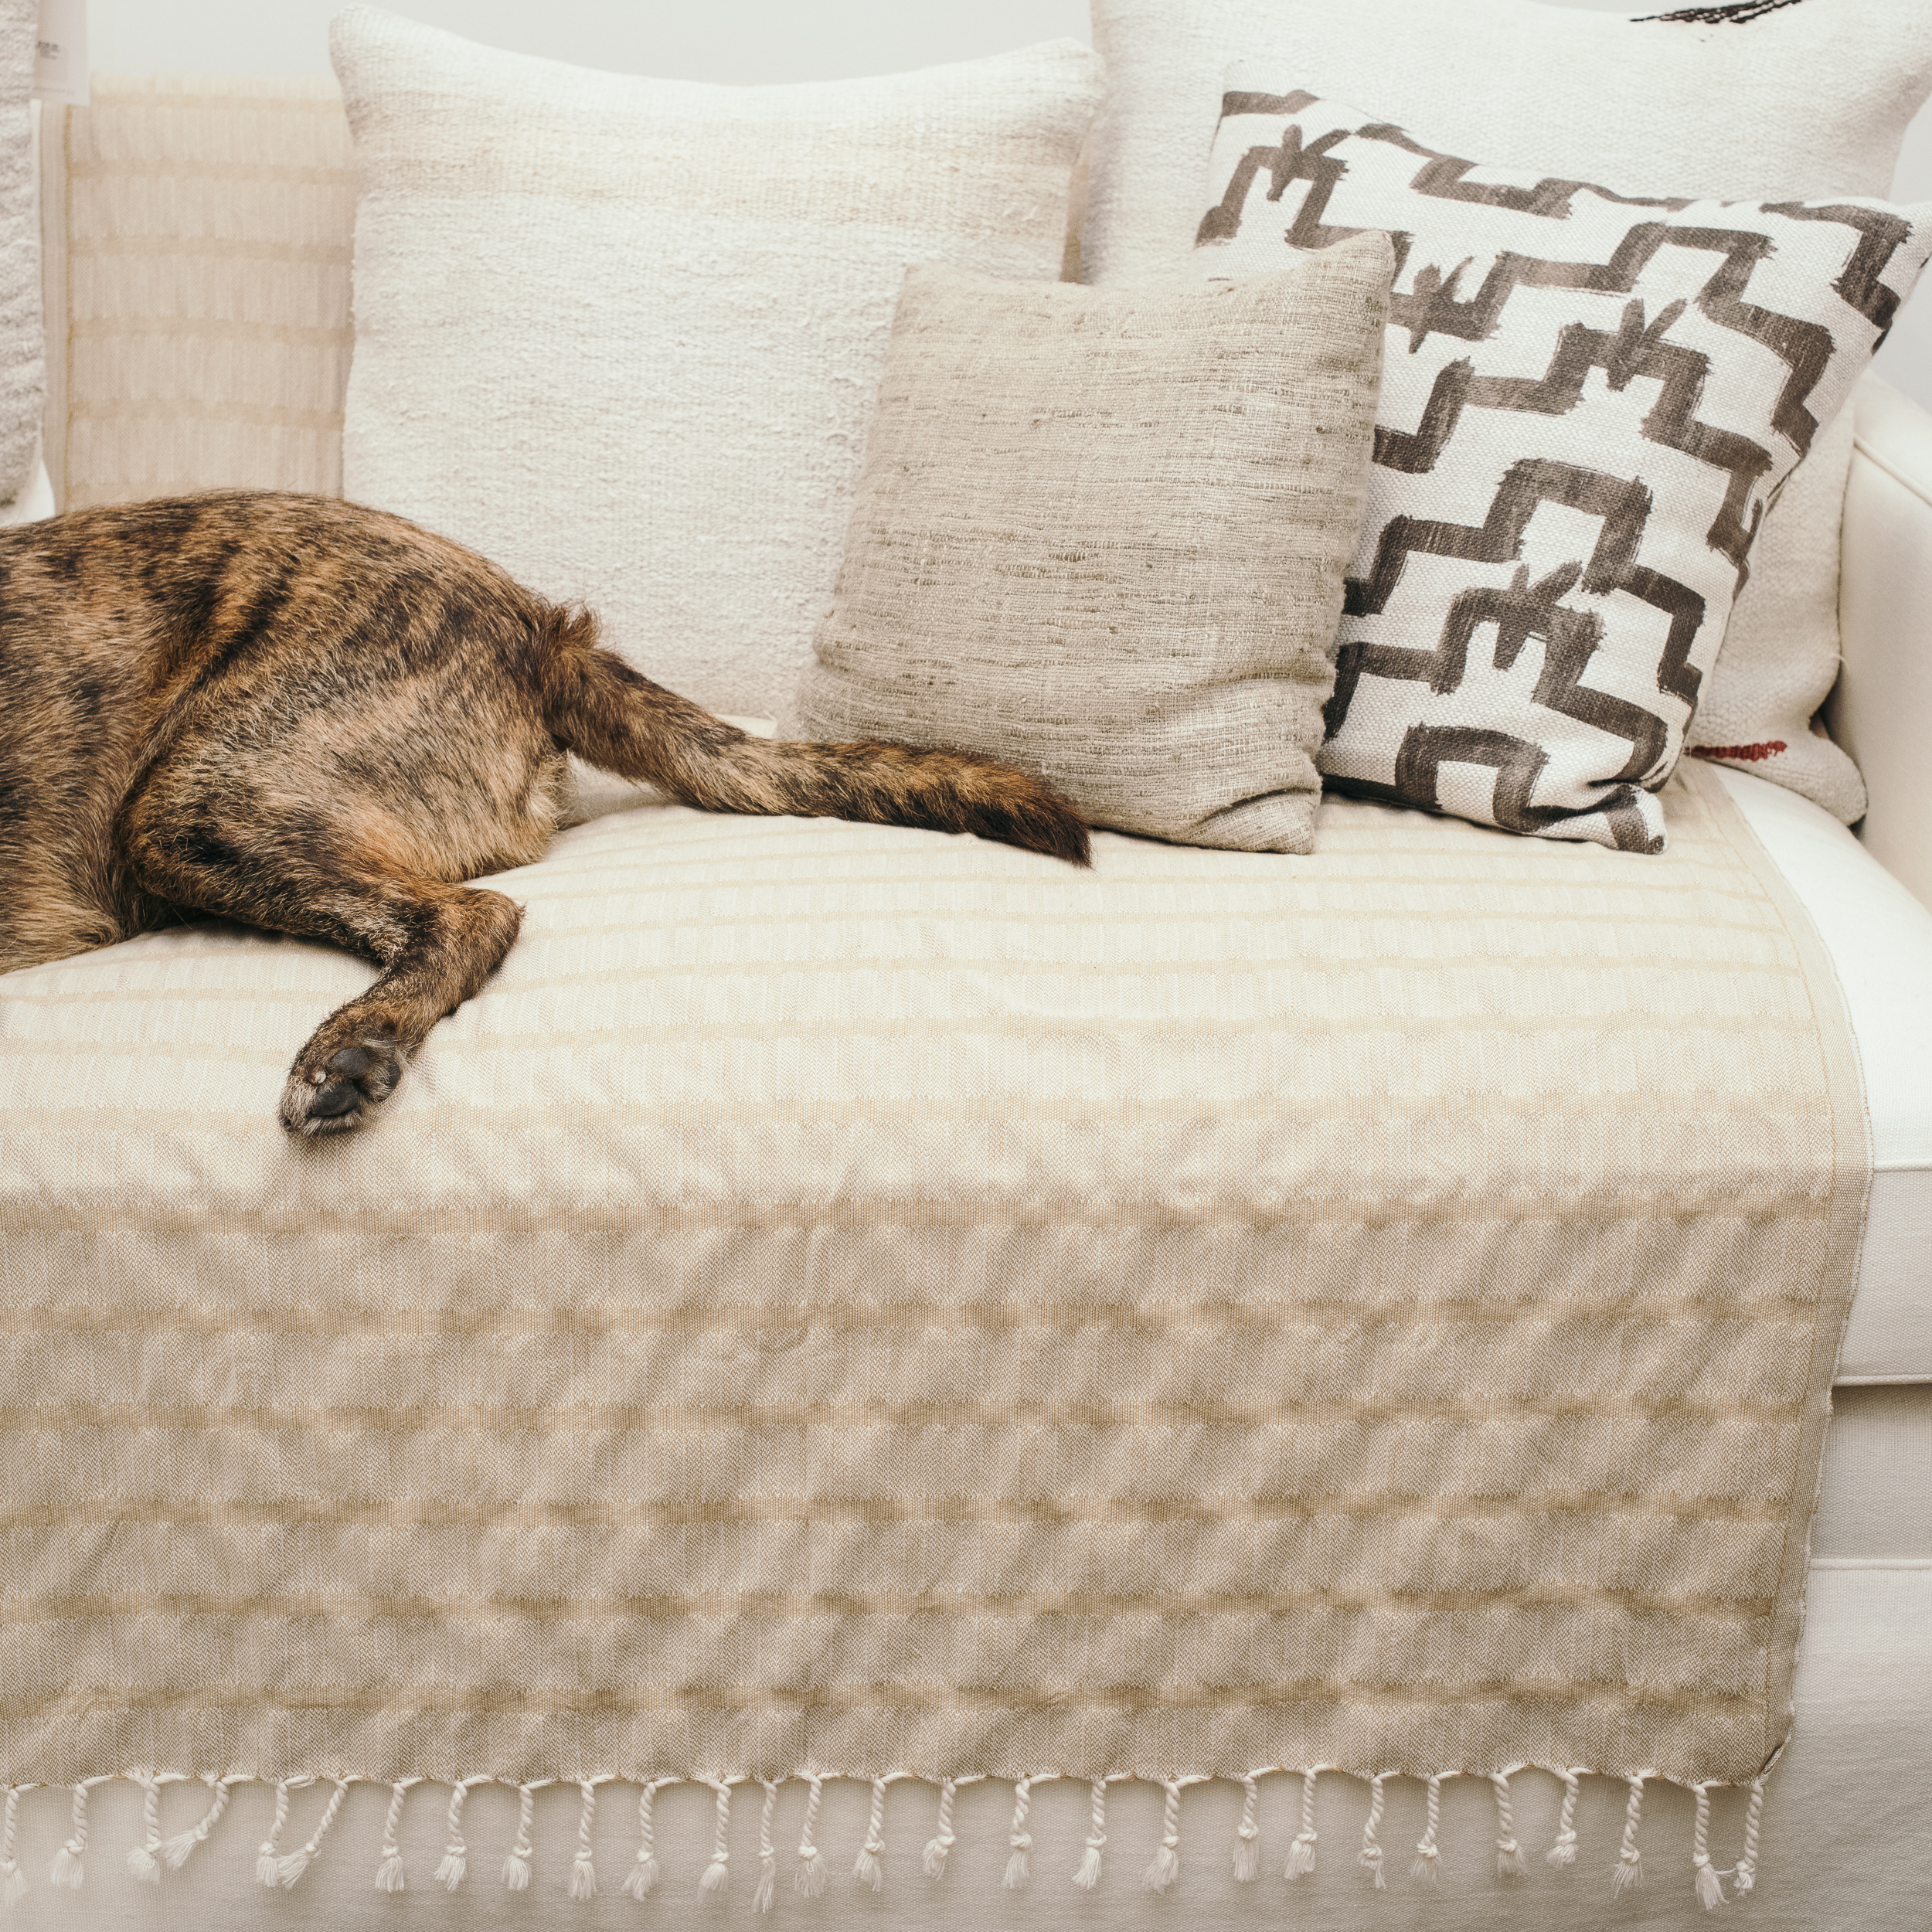 Loomed_Sunday_Shop_Dog_Blanket-8.jpg